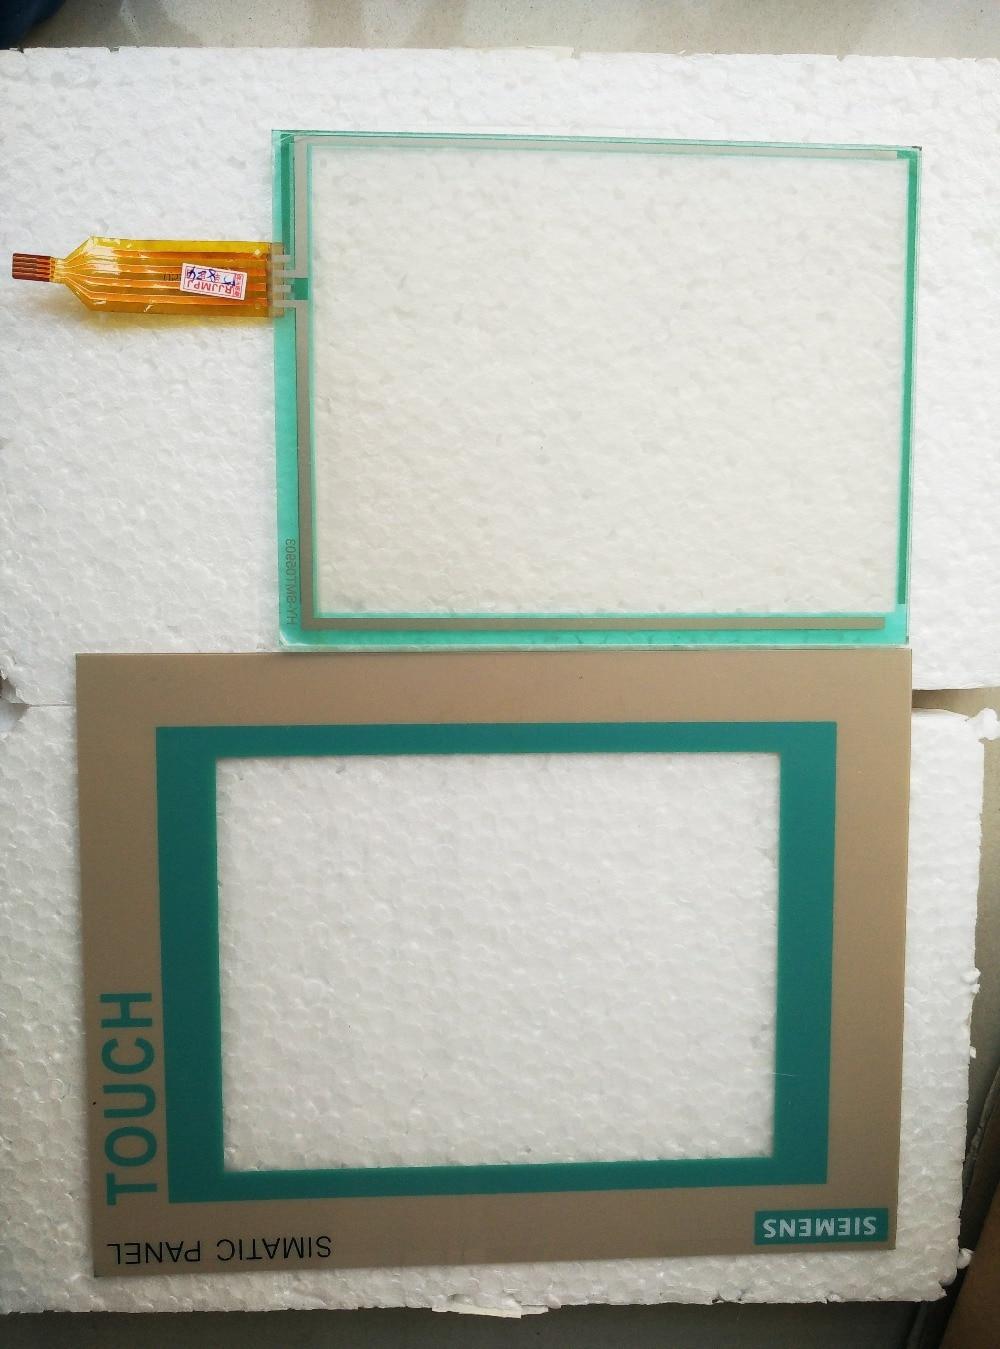 6AV6545-0BA15-2AX0,6AV6 545-0BA15-2AX0 Touch glass panel+protective film for Siemens TP170A NEW dhl eub 5pcs new kinoc protective film mt4414te 15 18